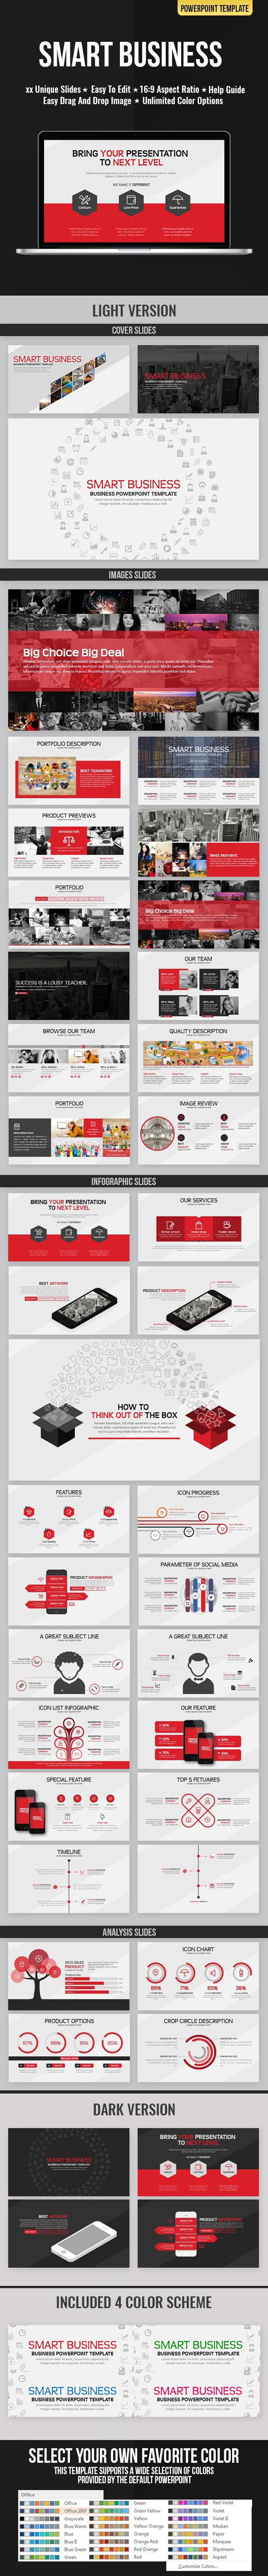 Smart Business Presentation